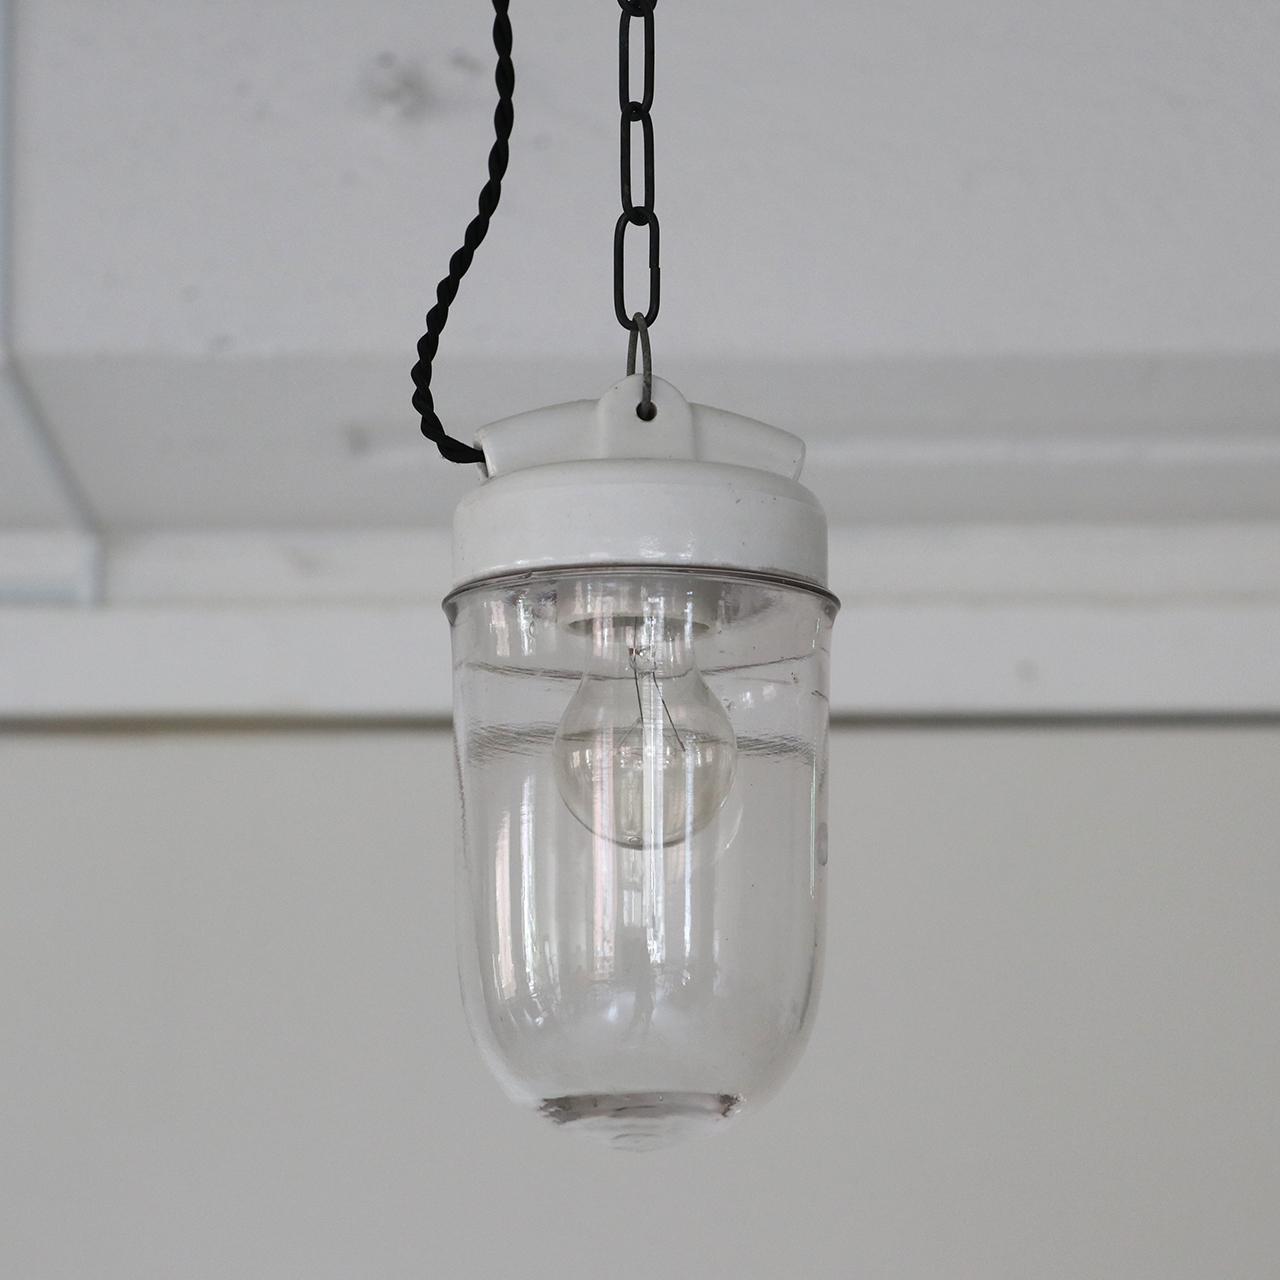 Industrial pendant lamp